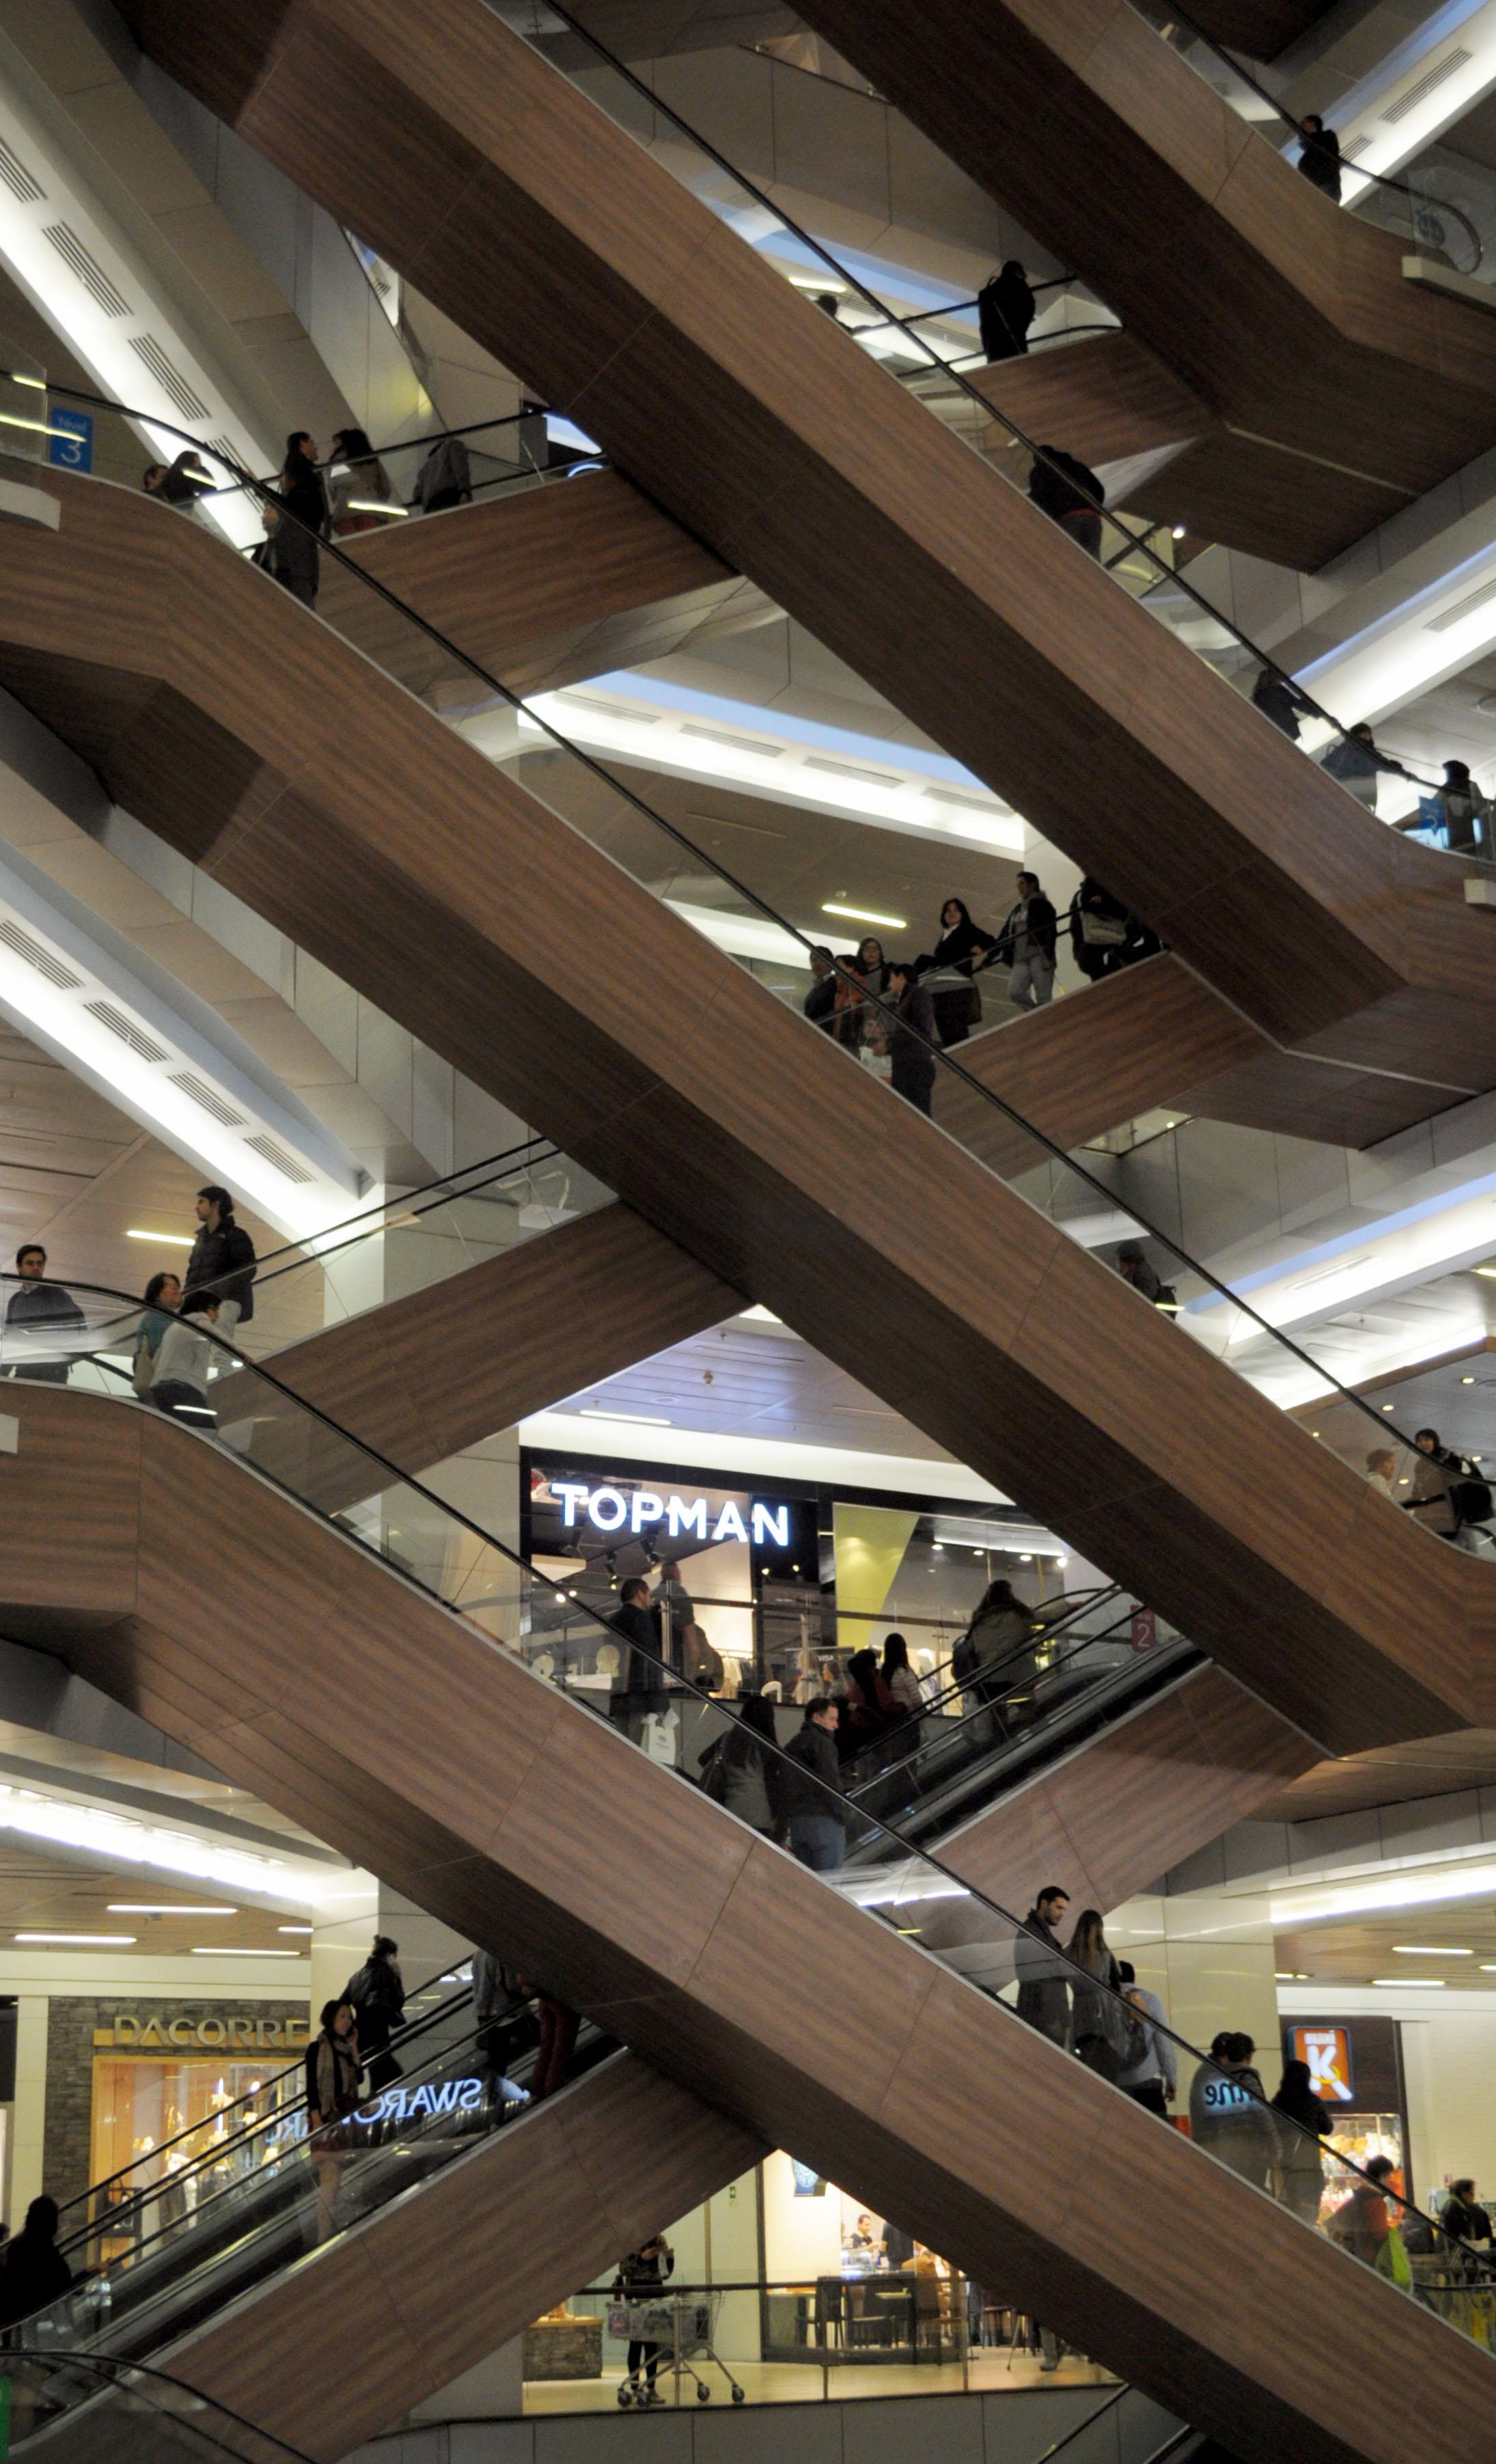 Urša Gradišnik: Capitalist stairs